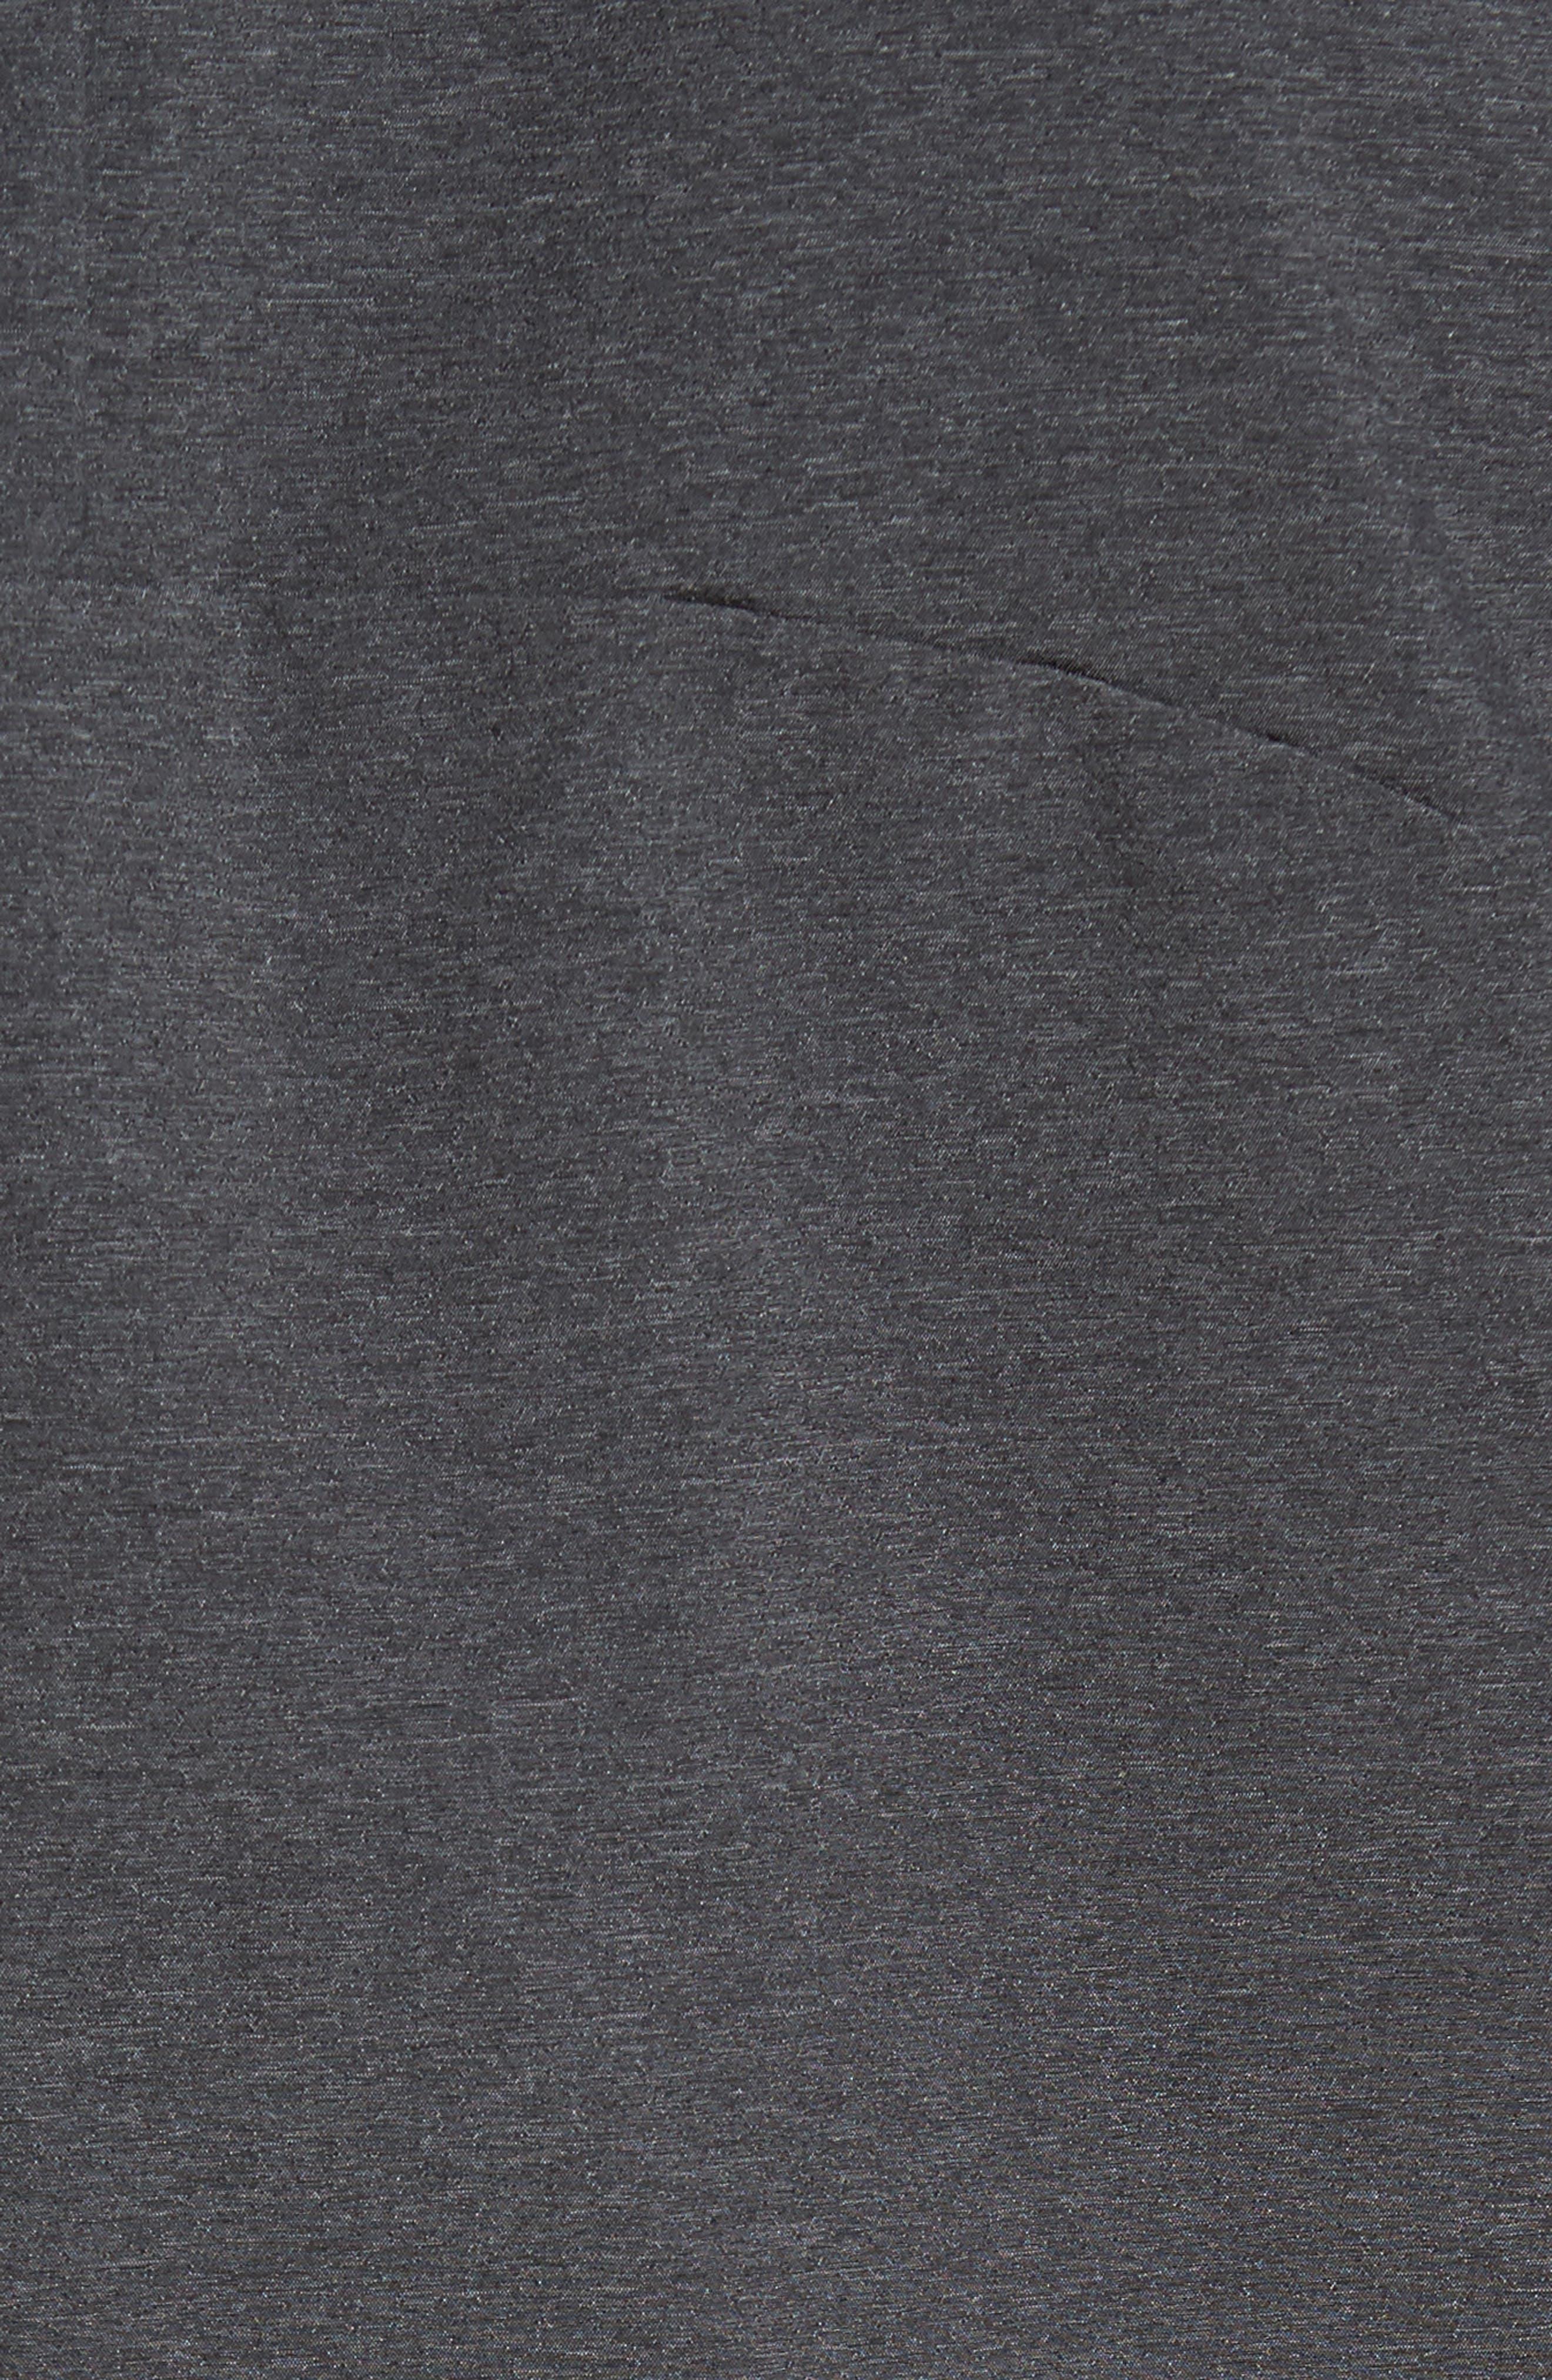 Apex Saroka Bomber Jacket,                             Alternate thumbnail 5, color,                             Tnf Black Denim